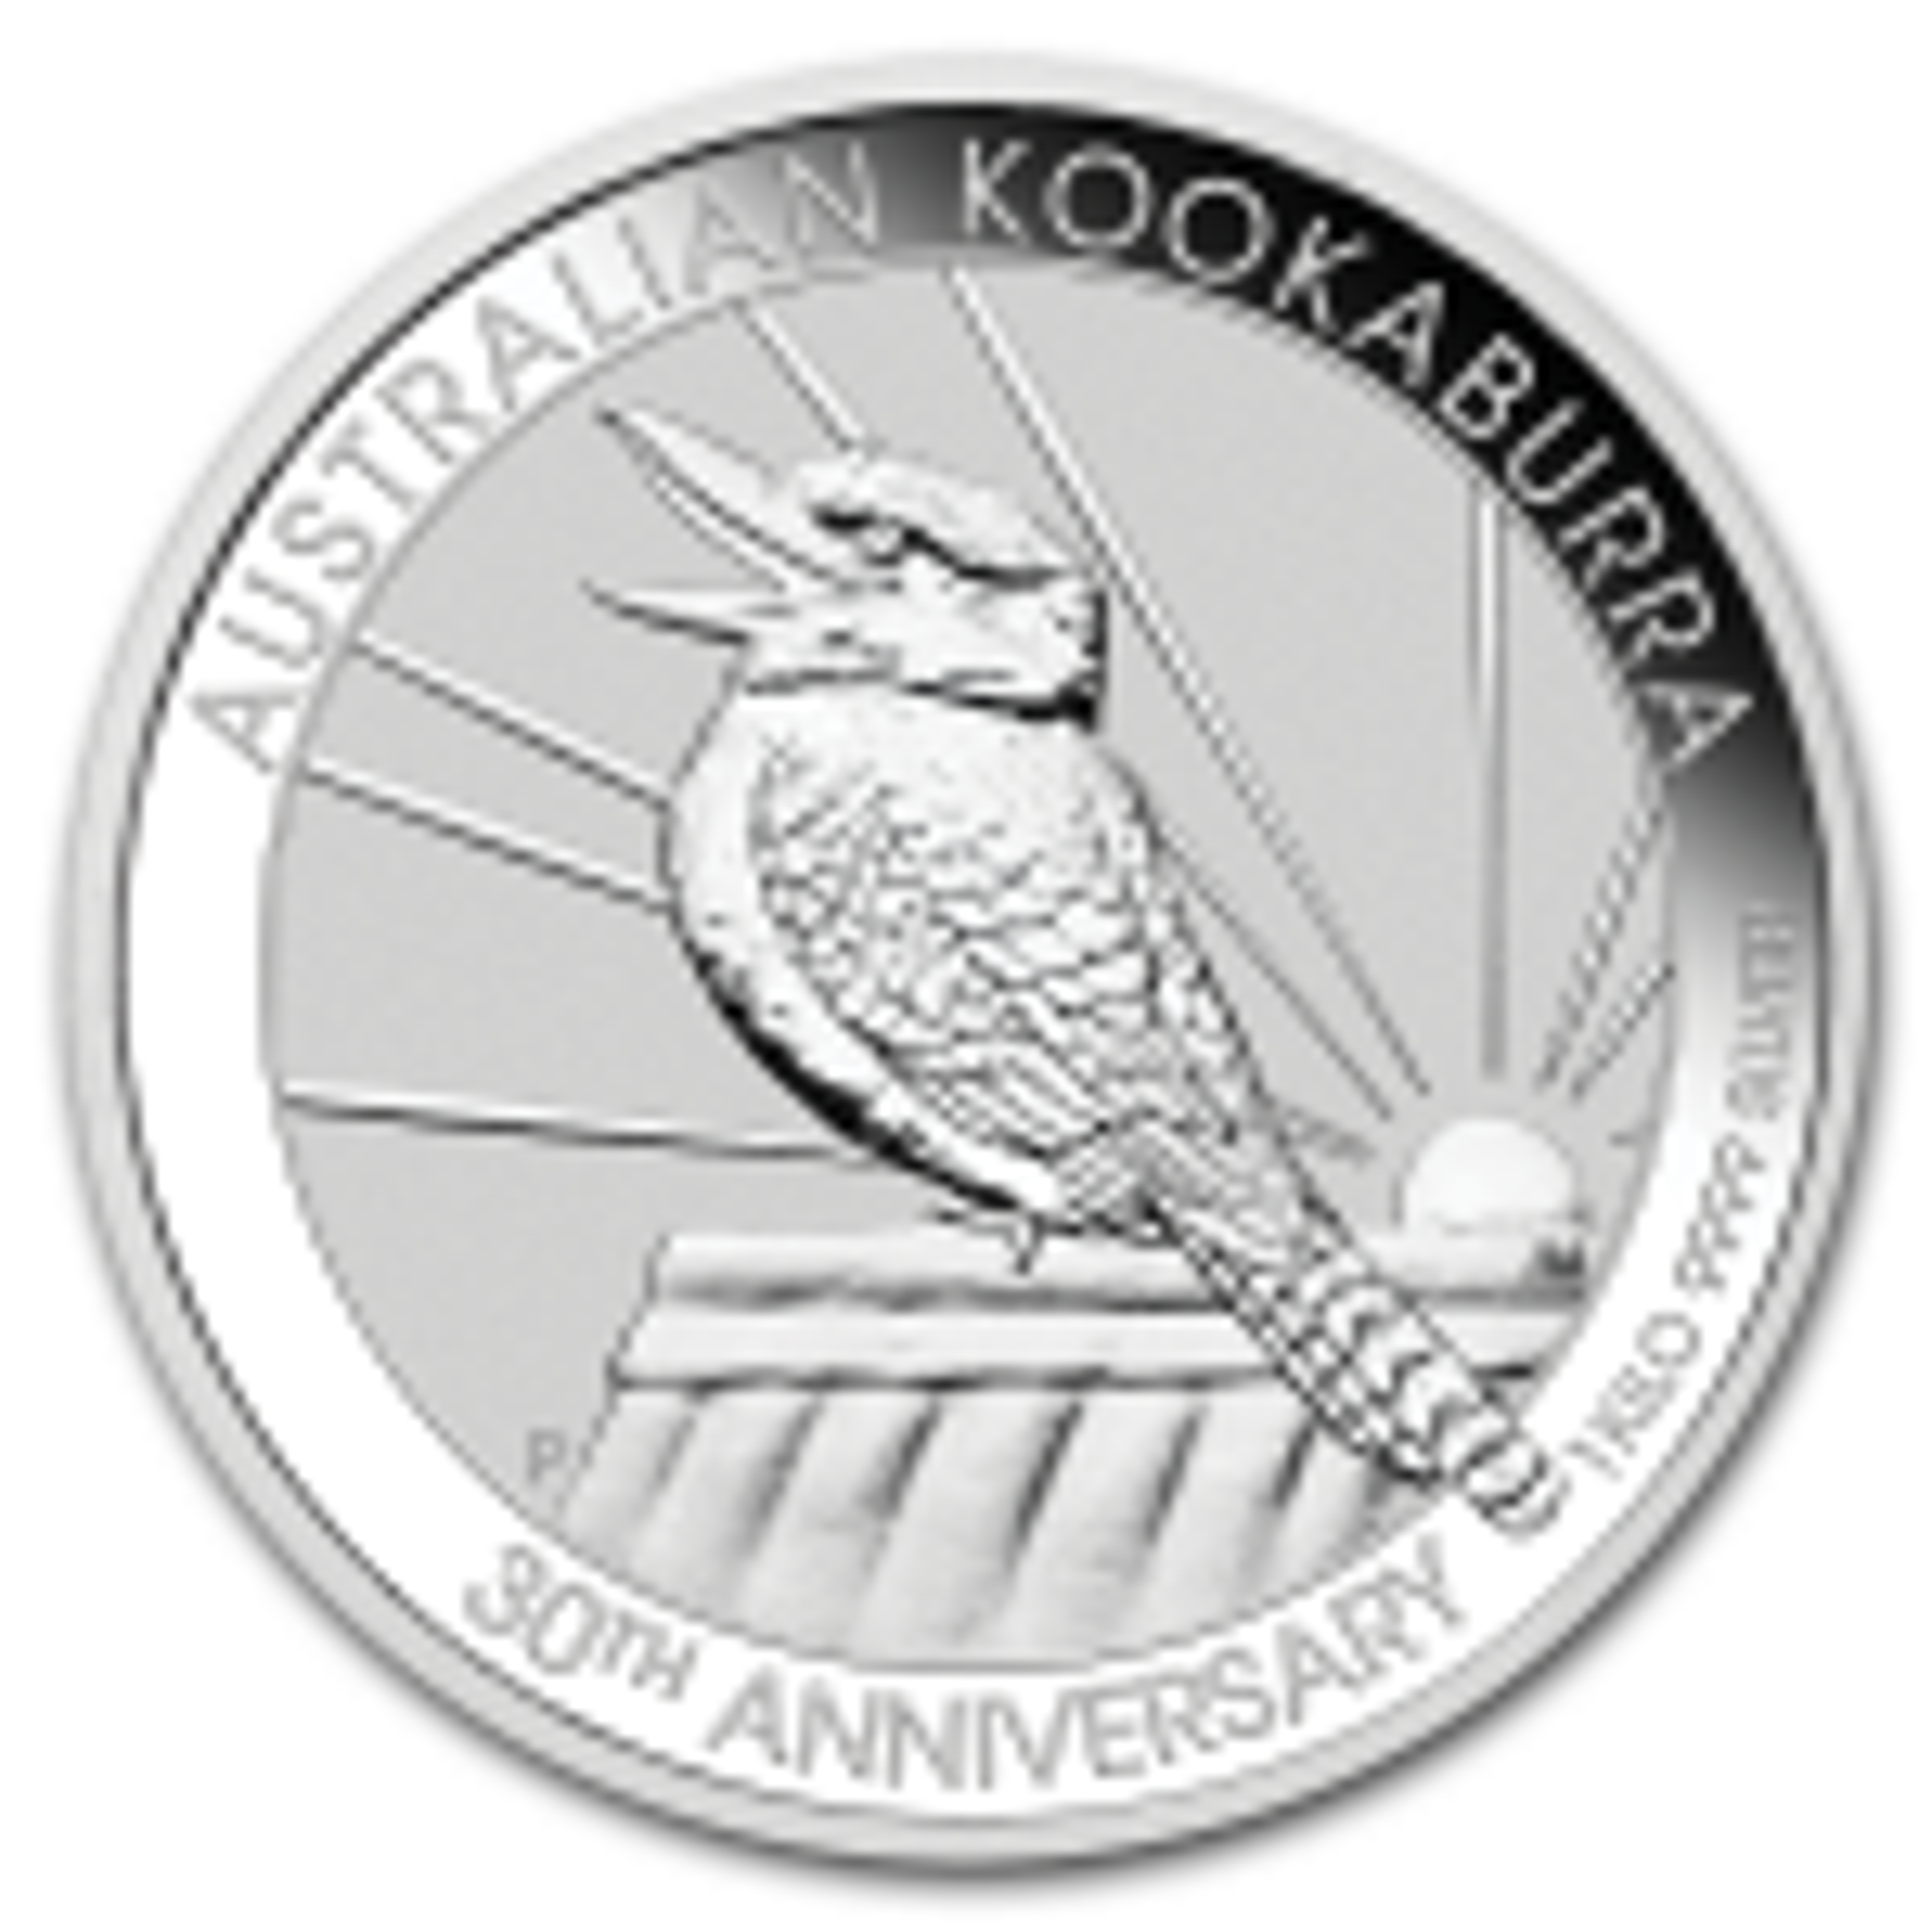 1 kilogram silver Kookaburra coin 2020